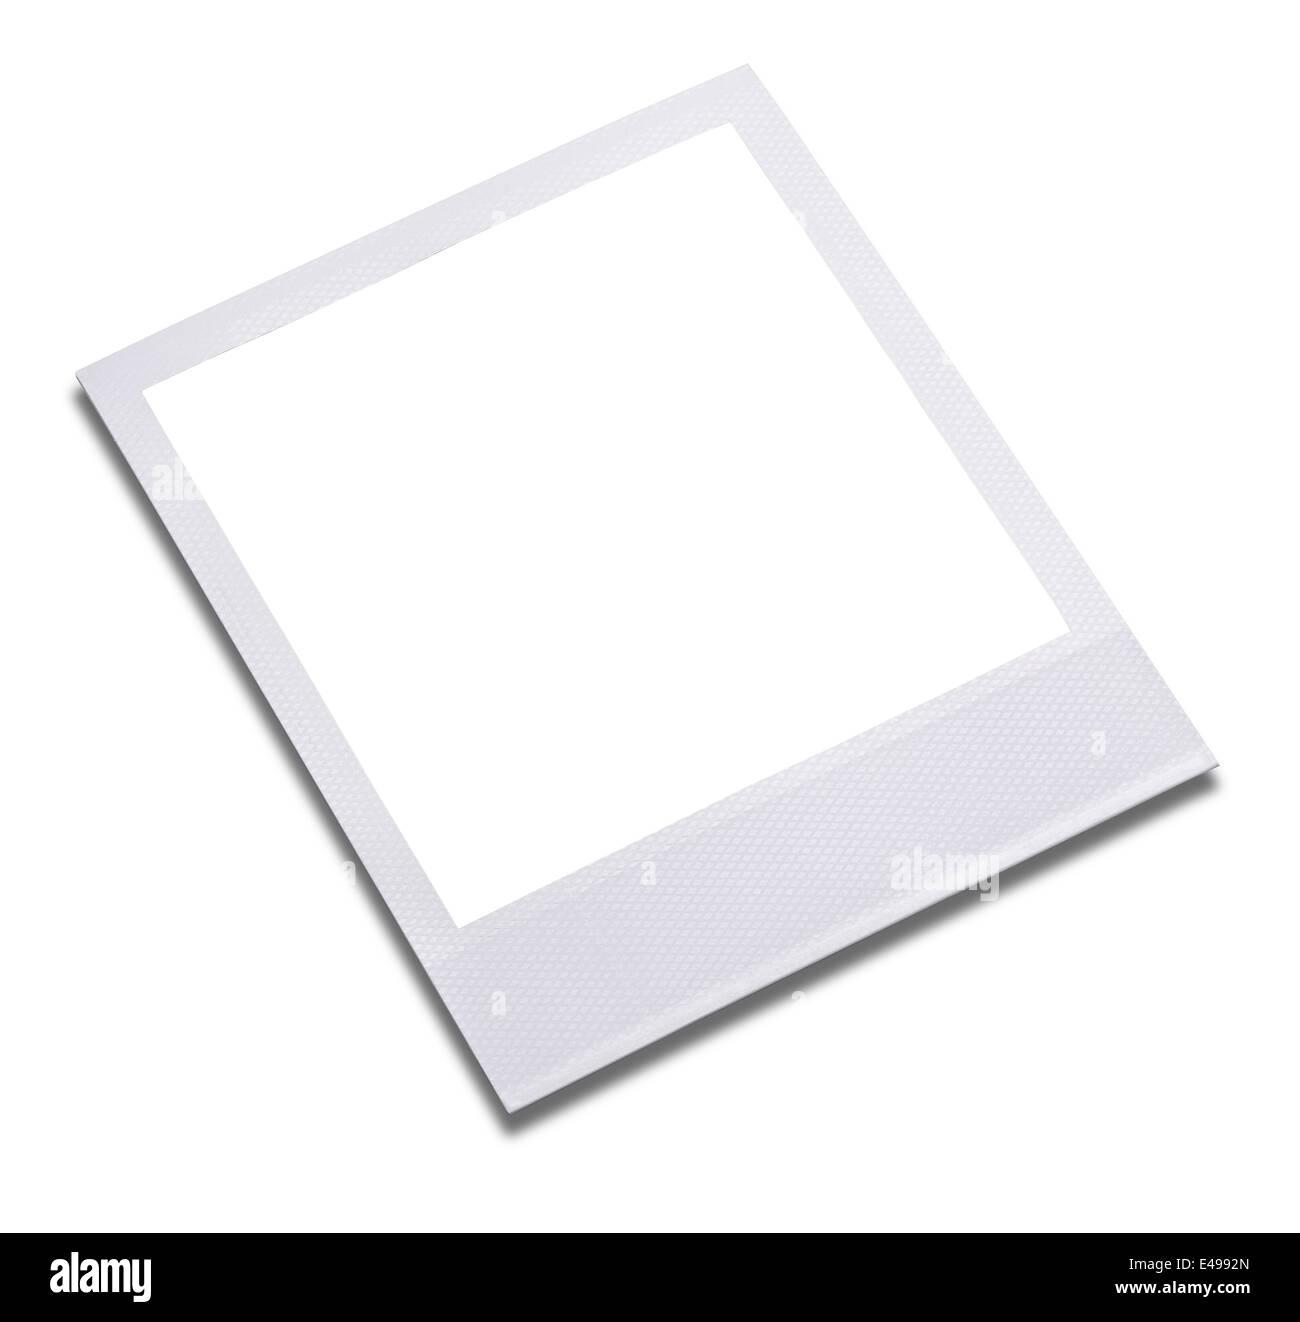 Imprimer cadre photo Blanc Photo Stock